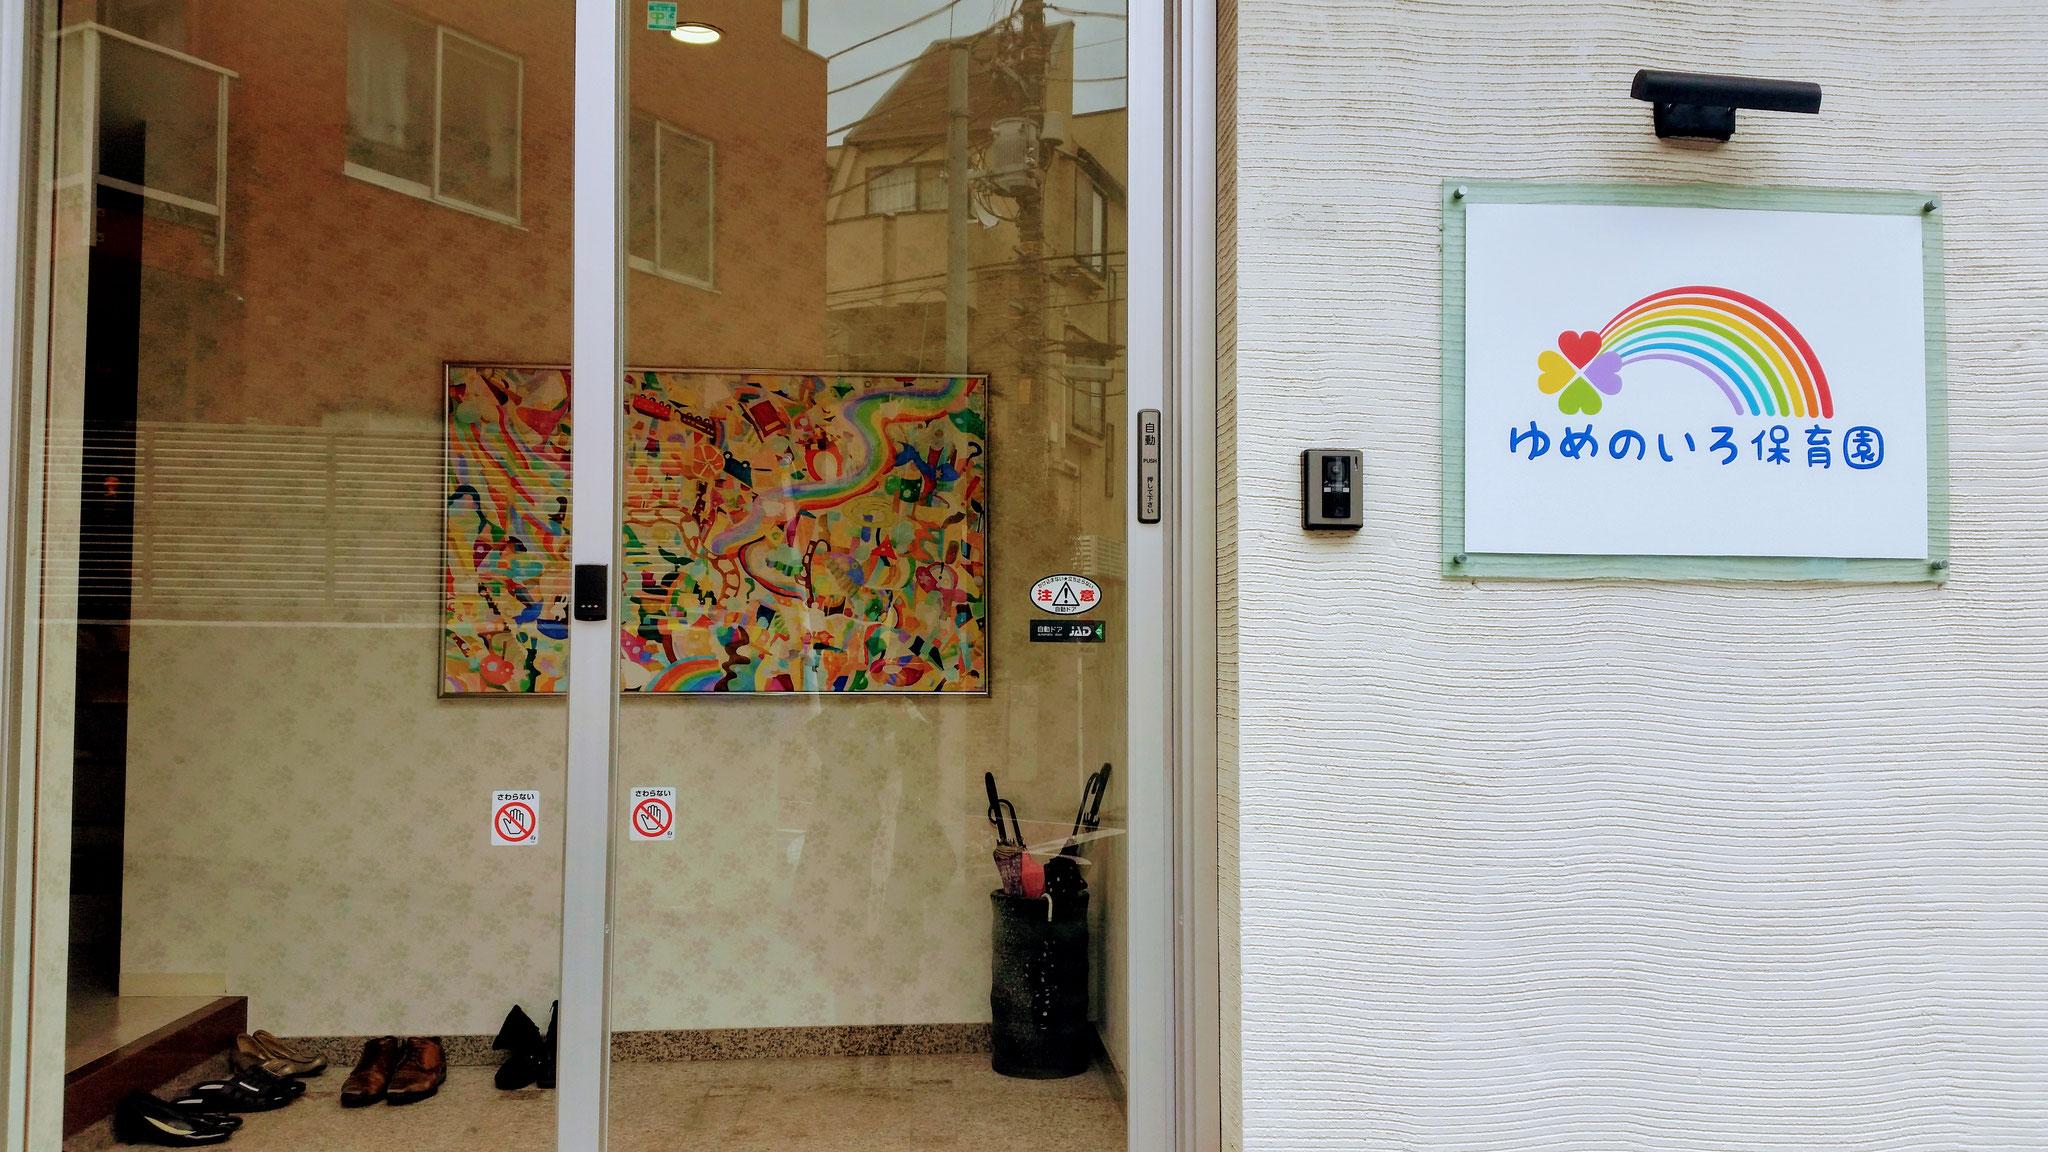 「Order for 中野区新中野ゆめのいろ保育園」夢色の記憶 オーダ 2017.4 (絵画)